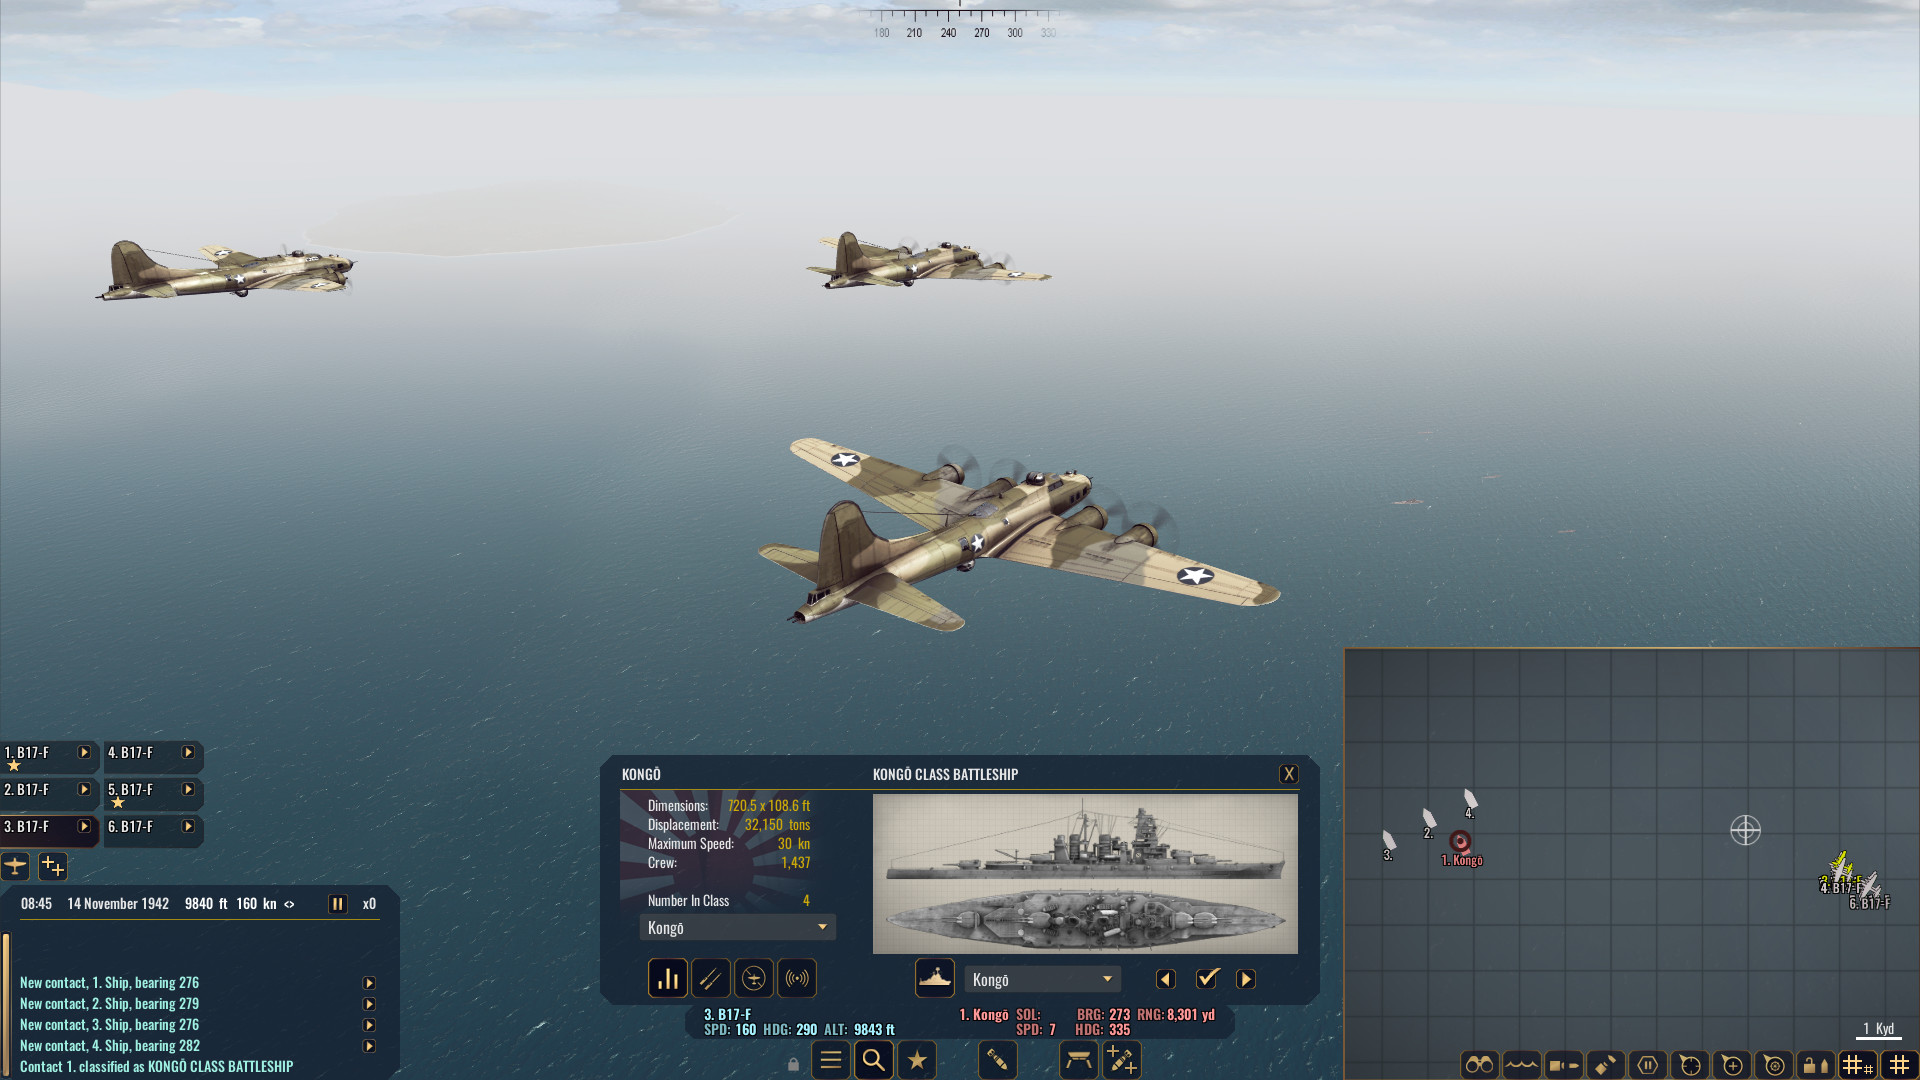 war-on-the-sea-pc-screenshot-04